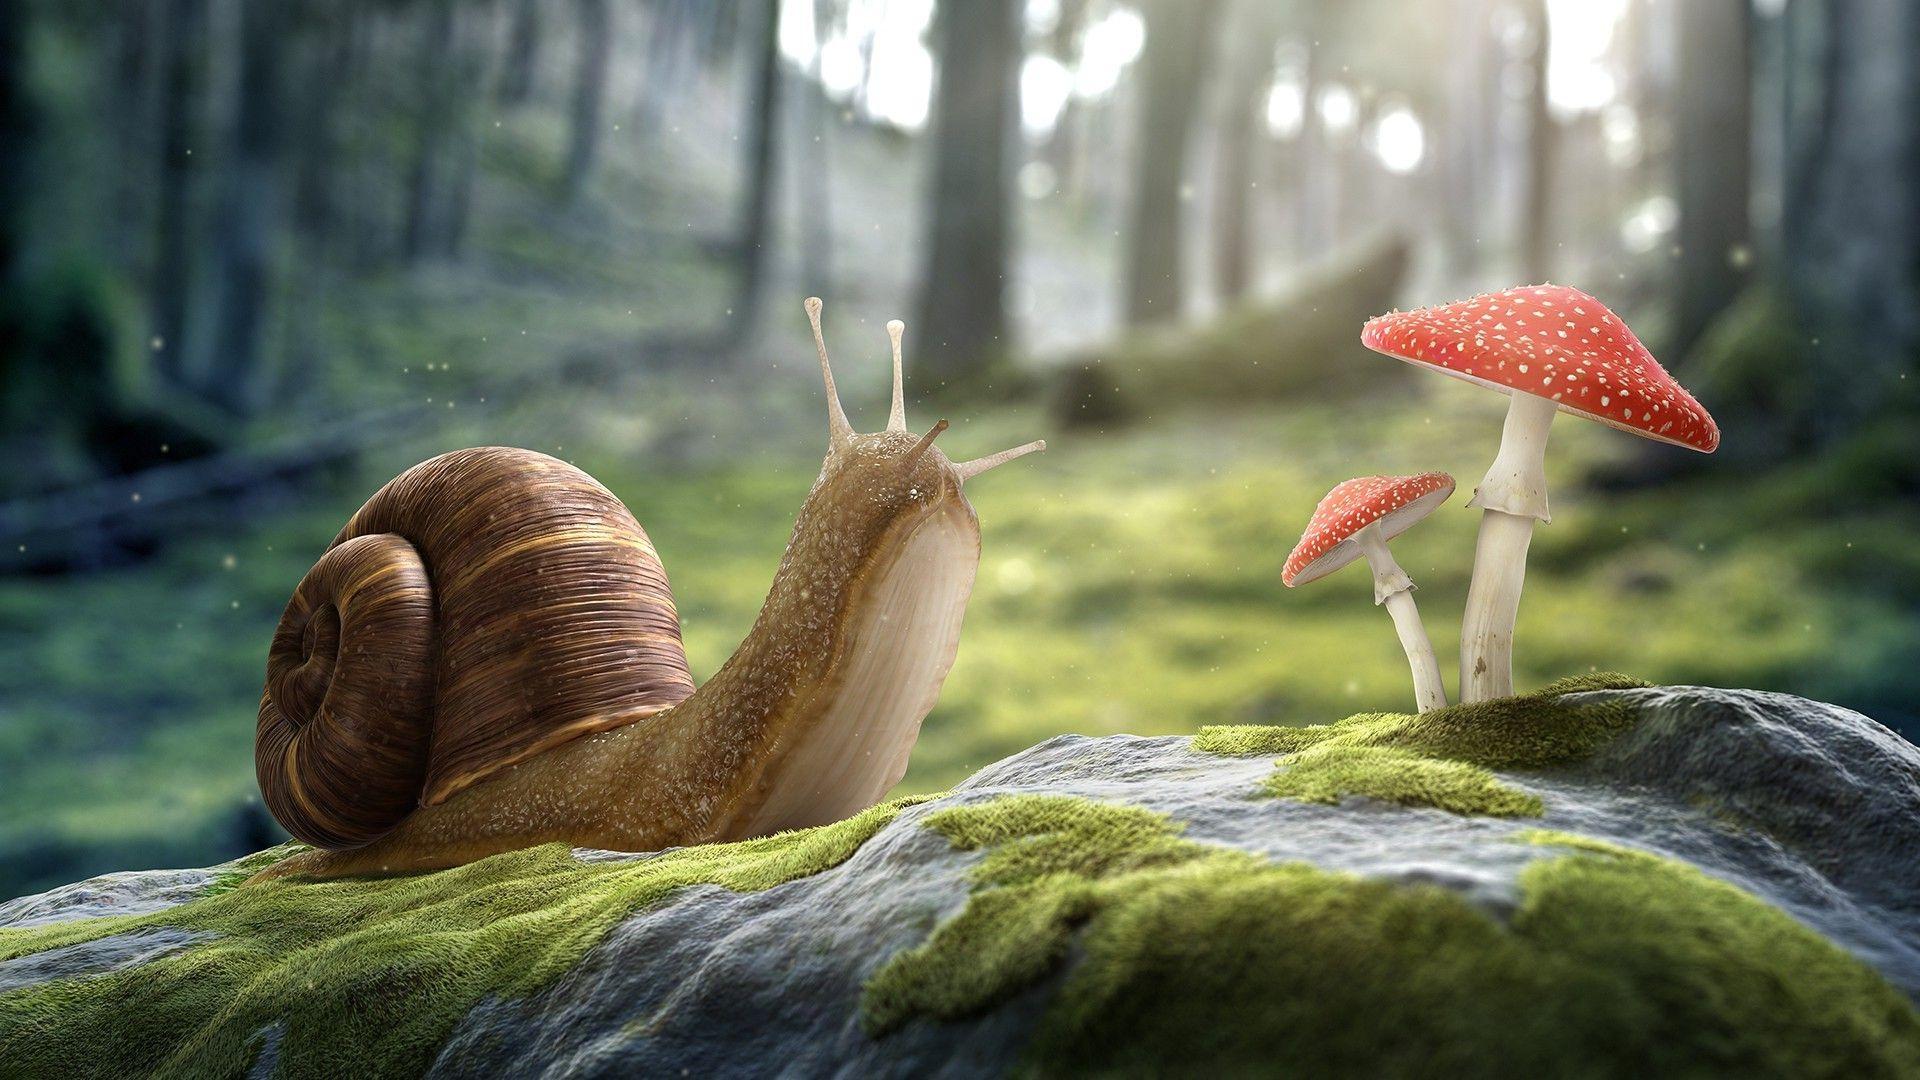 Digital Art Artwork Cgi 3d Nature Stones Snail Mushroom Trees Forest Macro Worms Eye View Depth Of Fi Worms Eye View Perspective Art Eyes Wallpaper